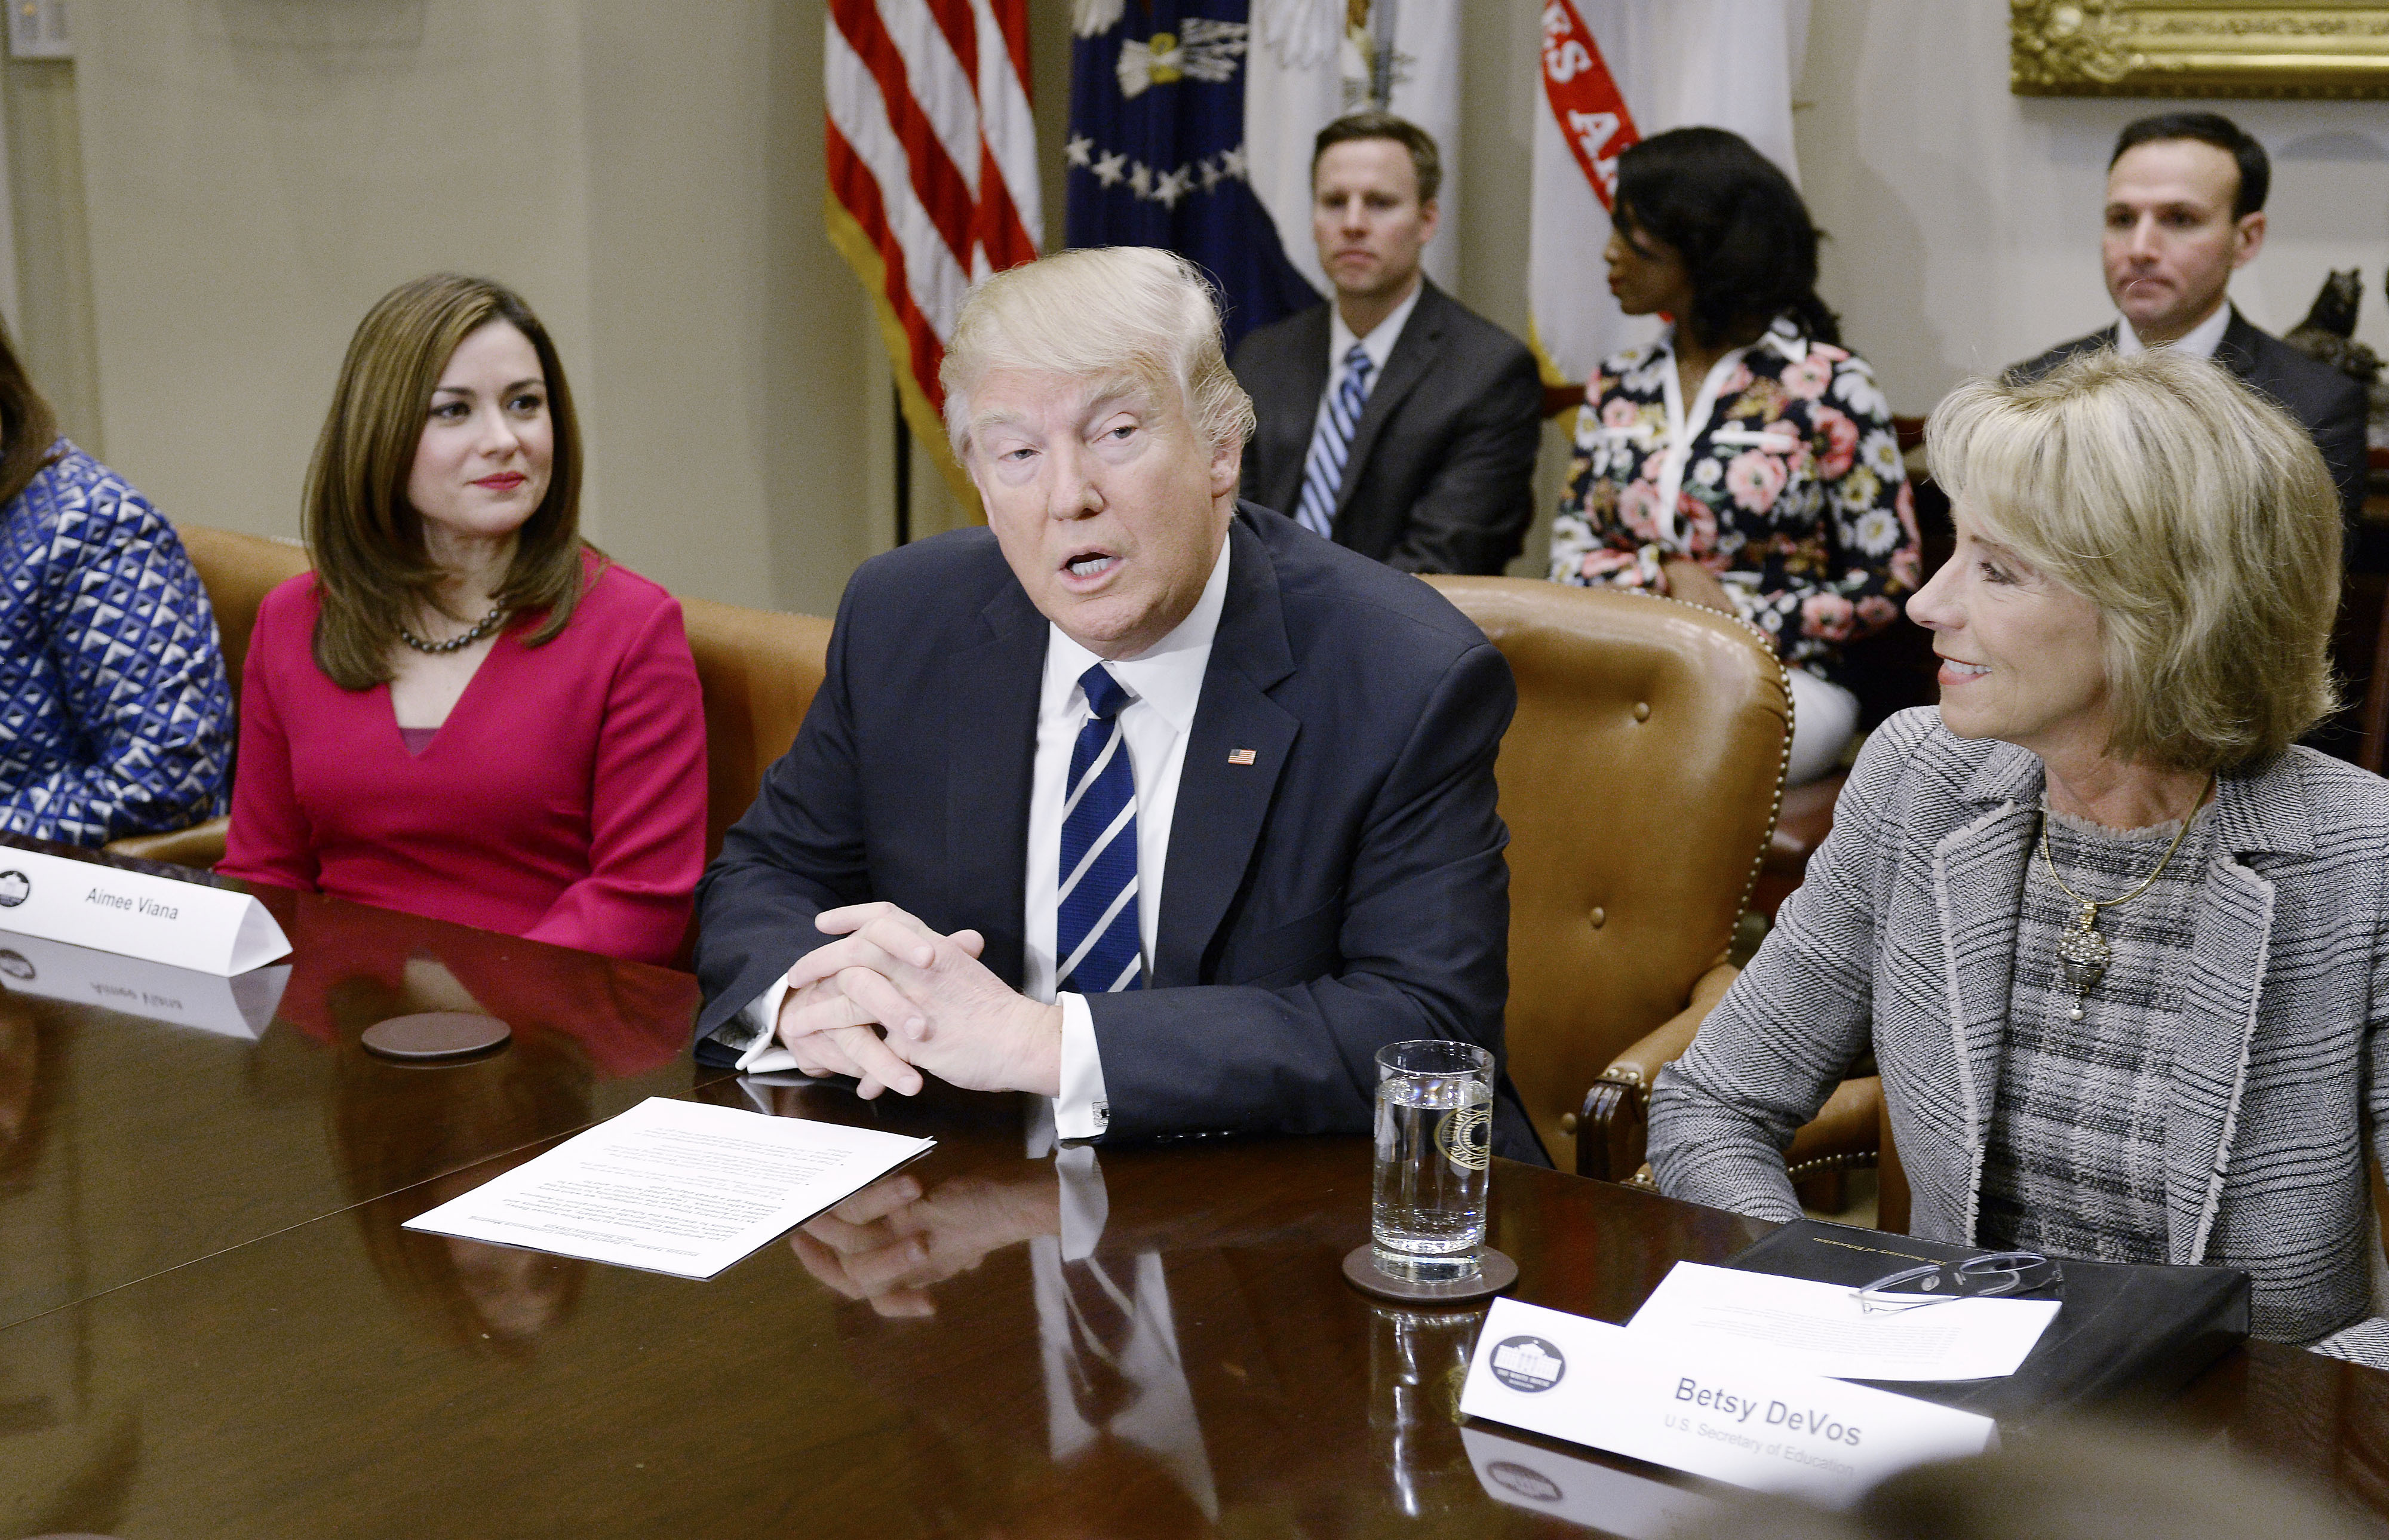 Donald Trump participates in a parent-teacher conference listenin